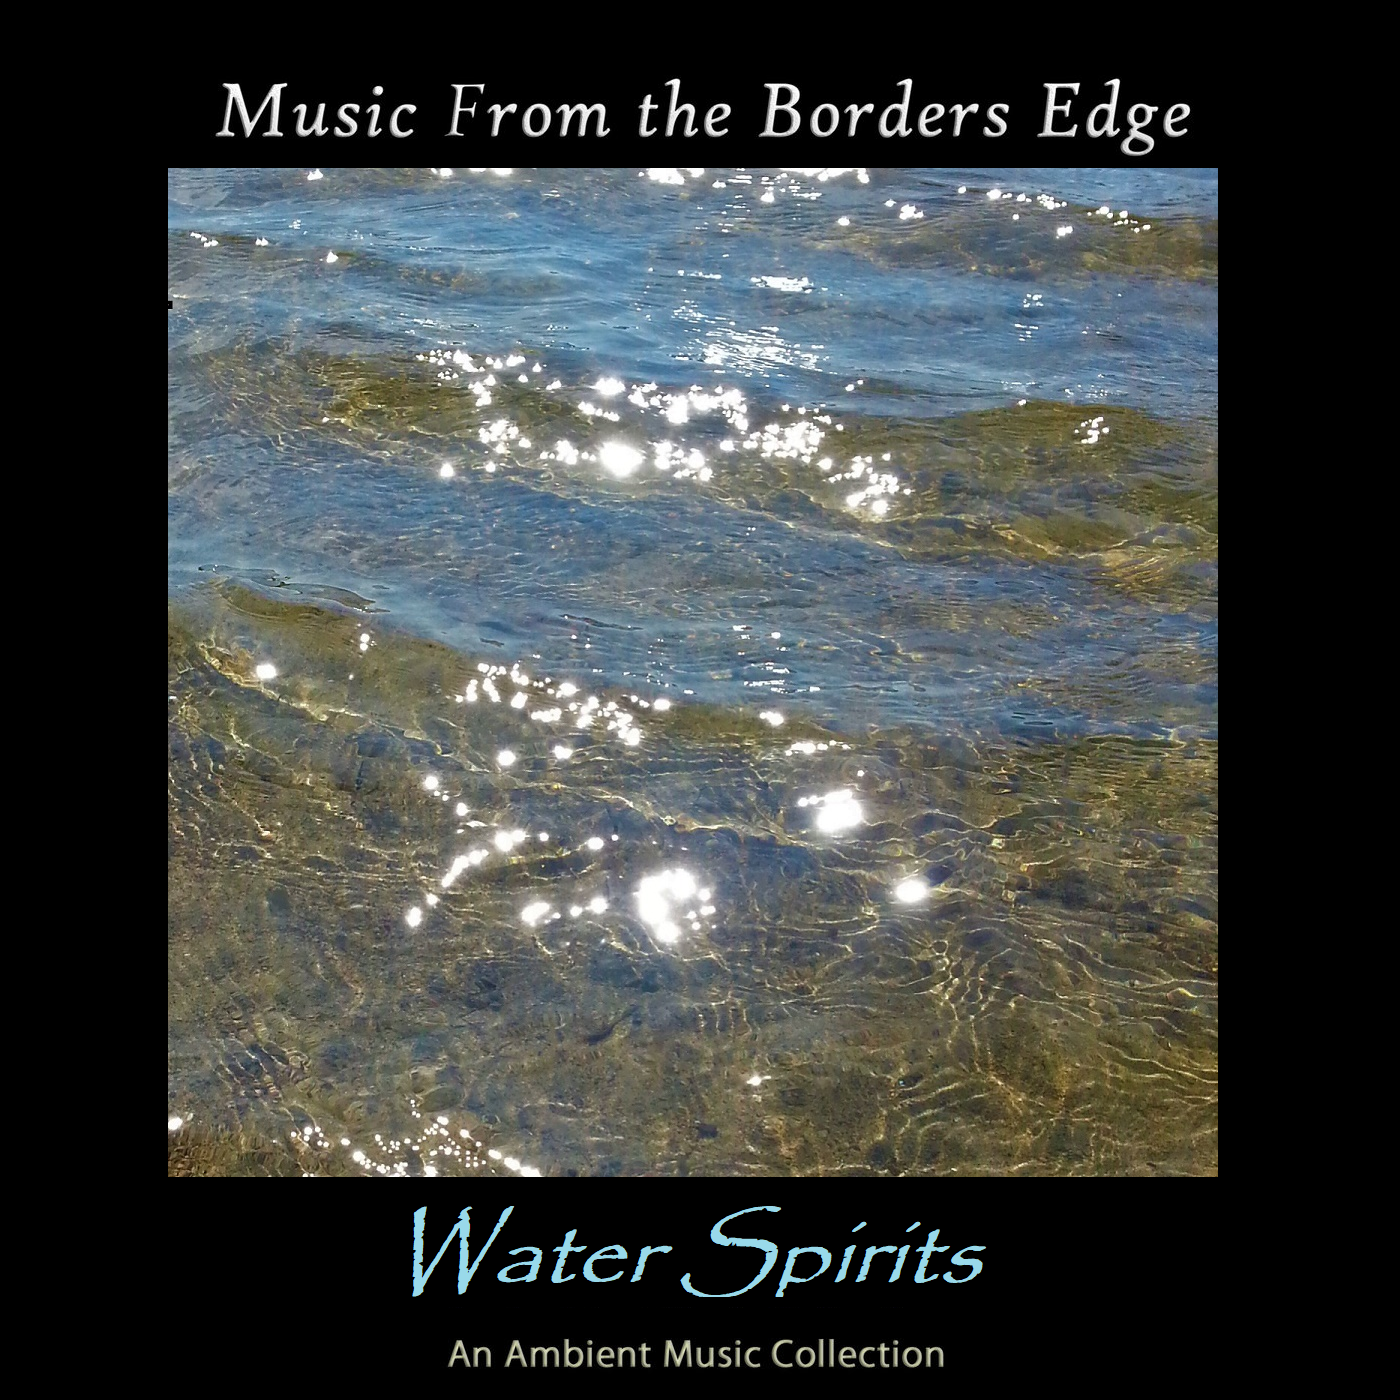 https://bordersedge.bandcamp.com/album/water-spirits